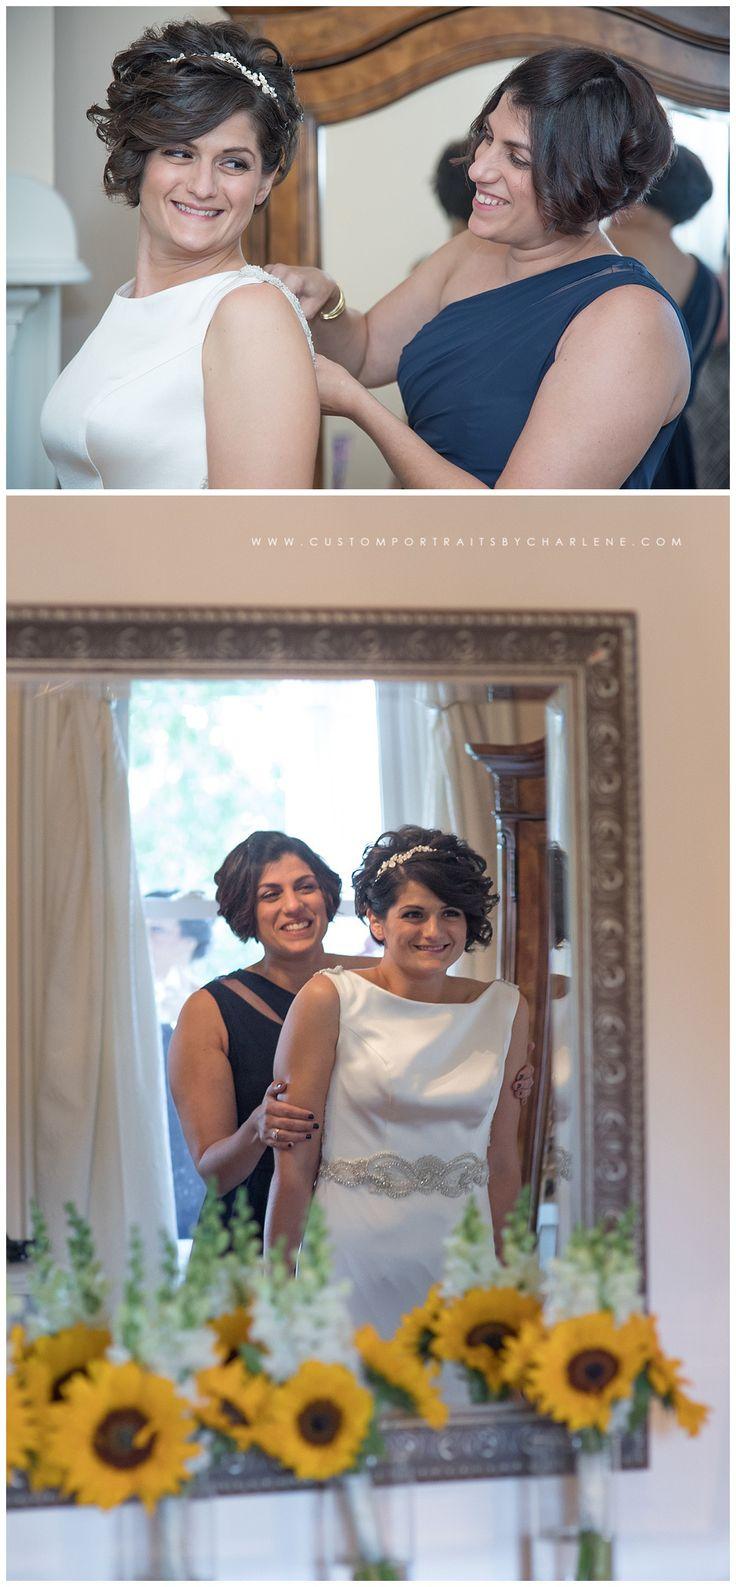 samantha & lucas   bramblewood at simmons hickory farm ceremony & reception   pittsburgh wedding photographer » custom portraits by charlene